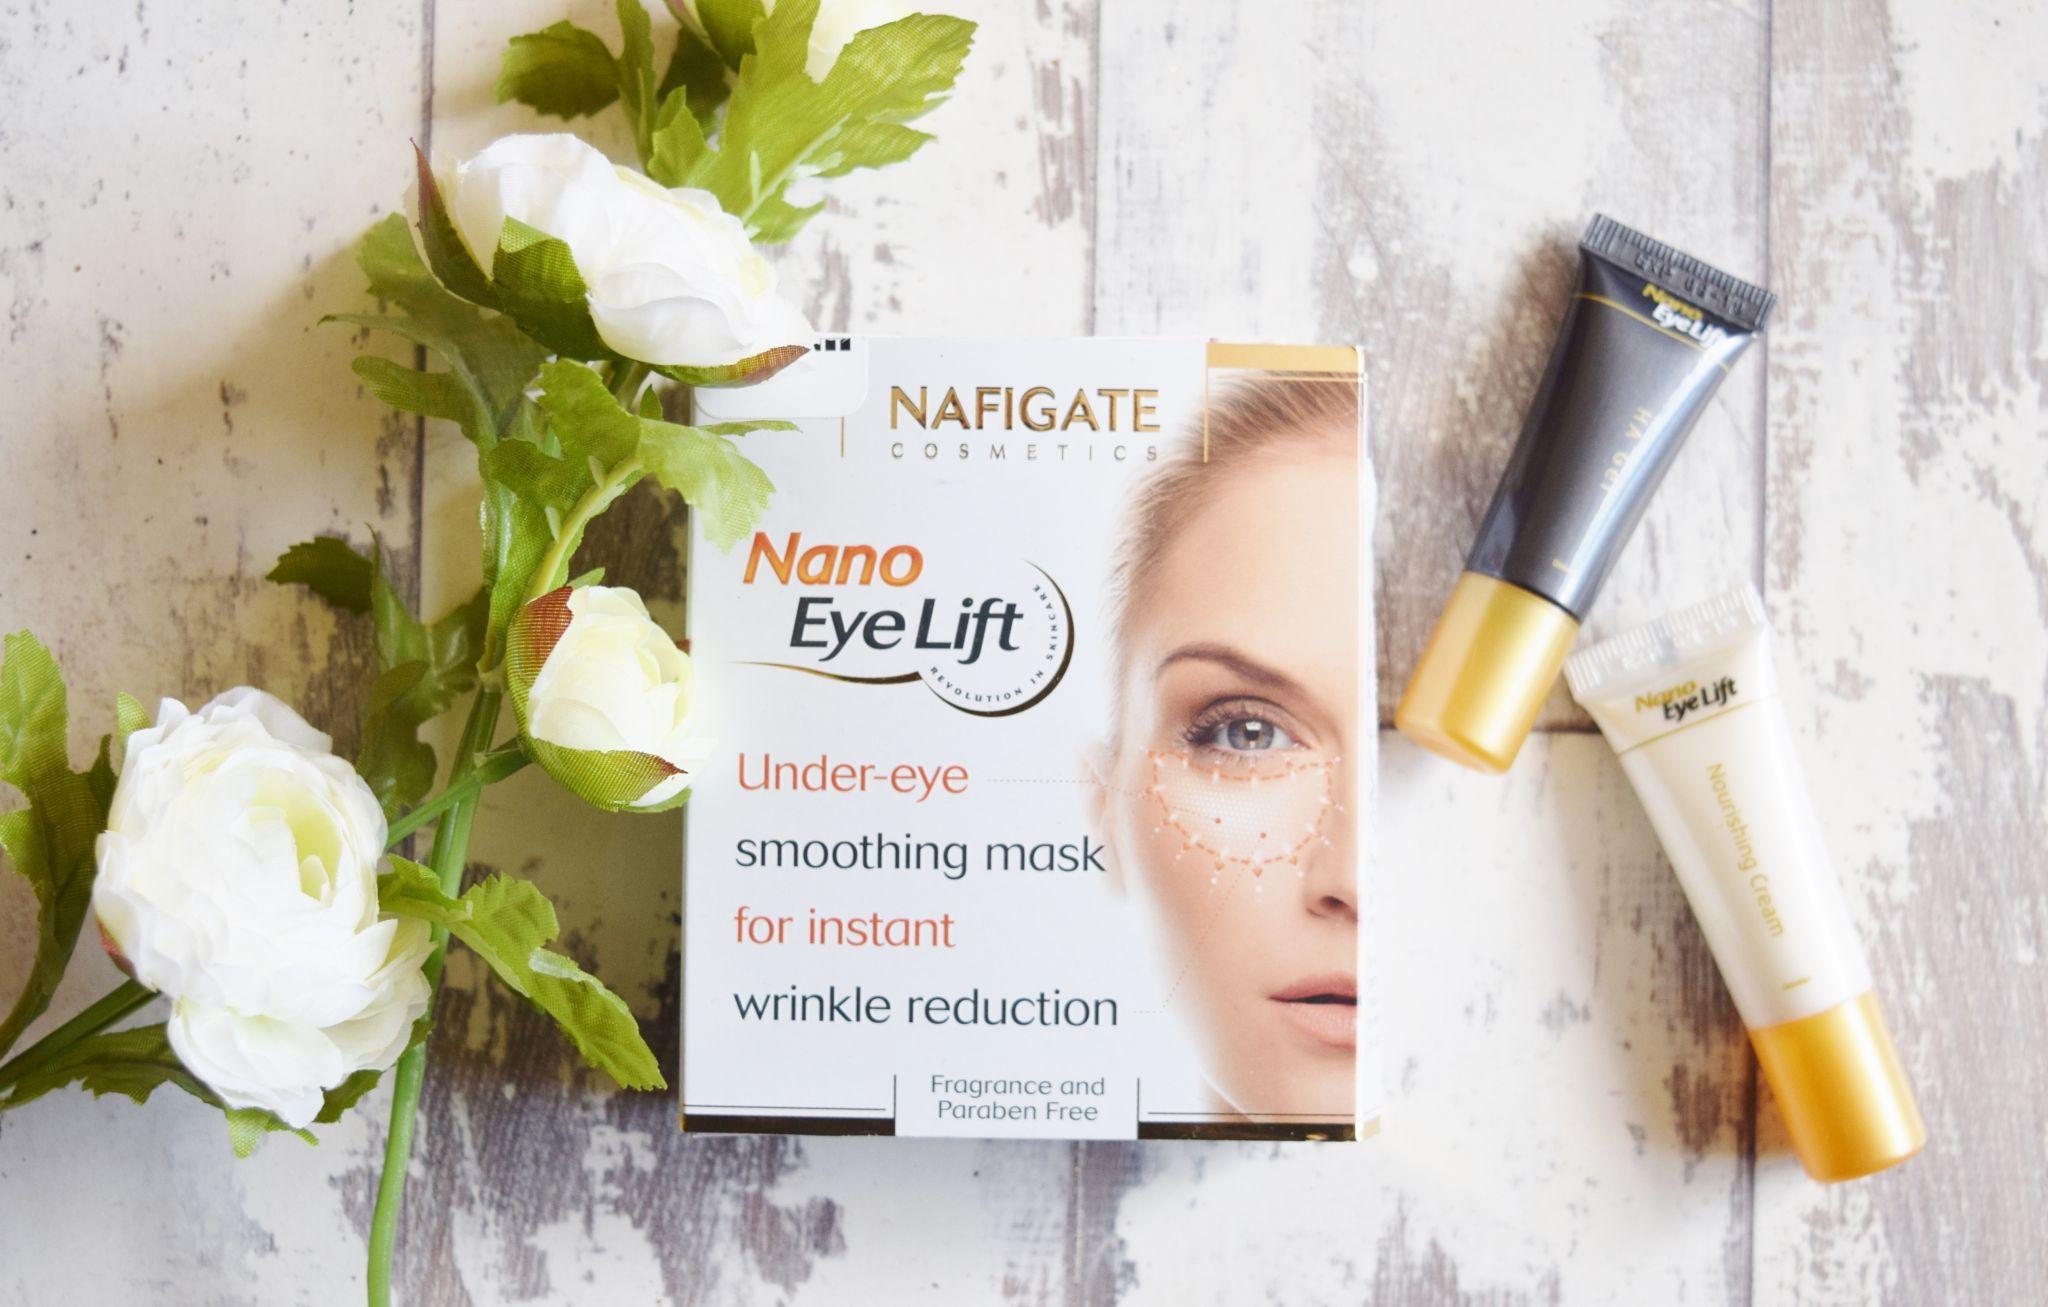 nafigate cosmetics nano eye lift